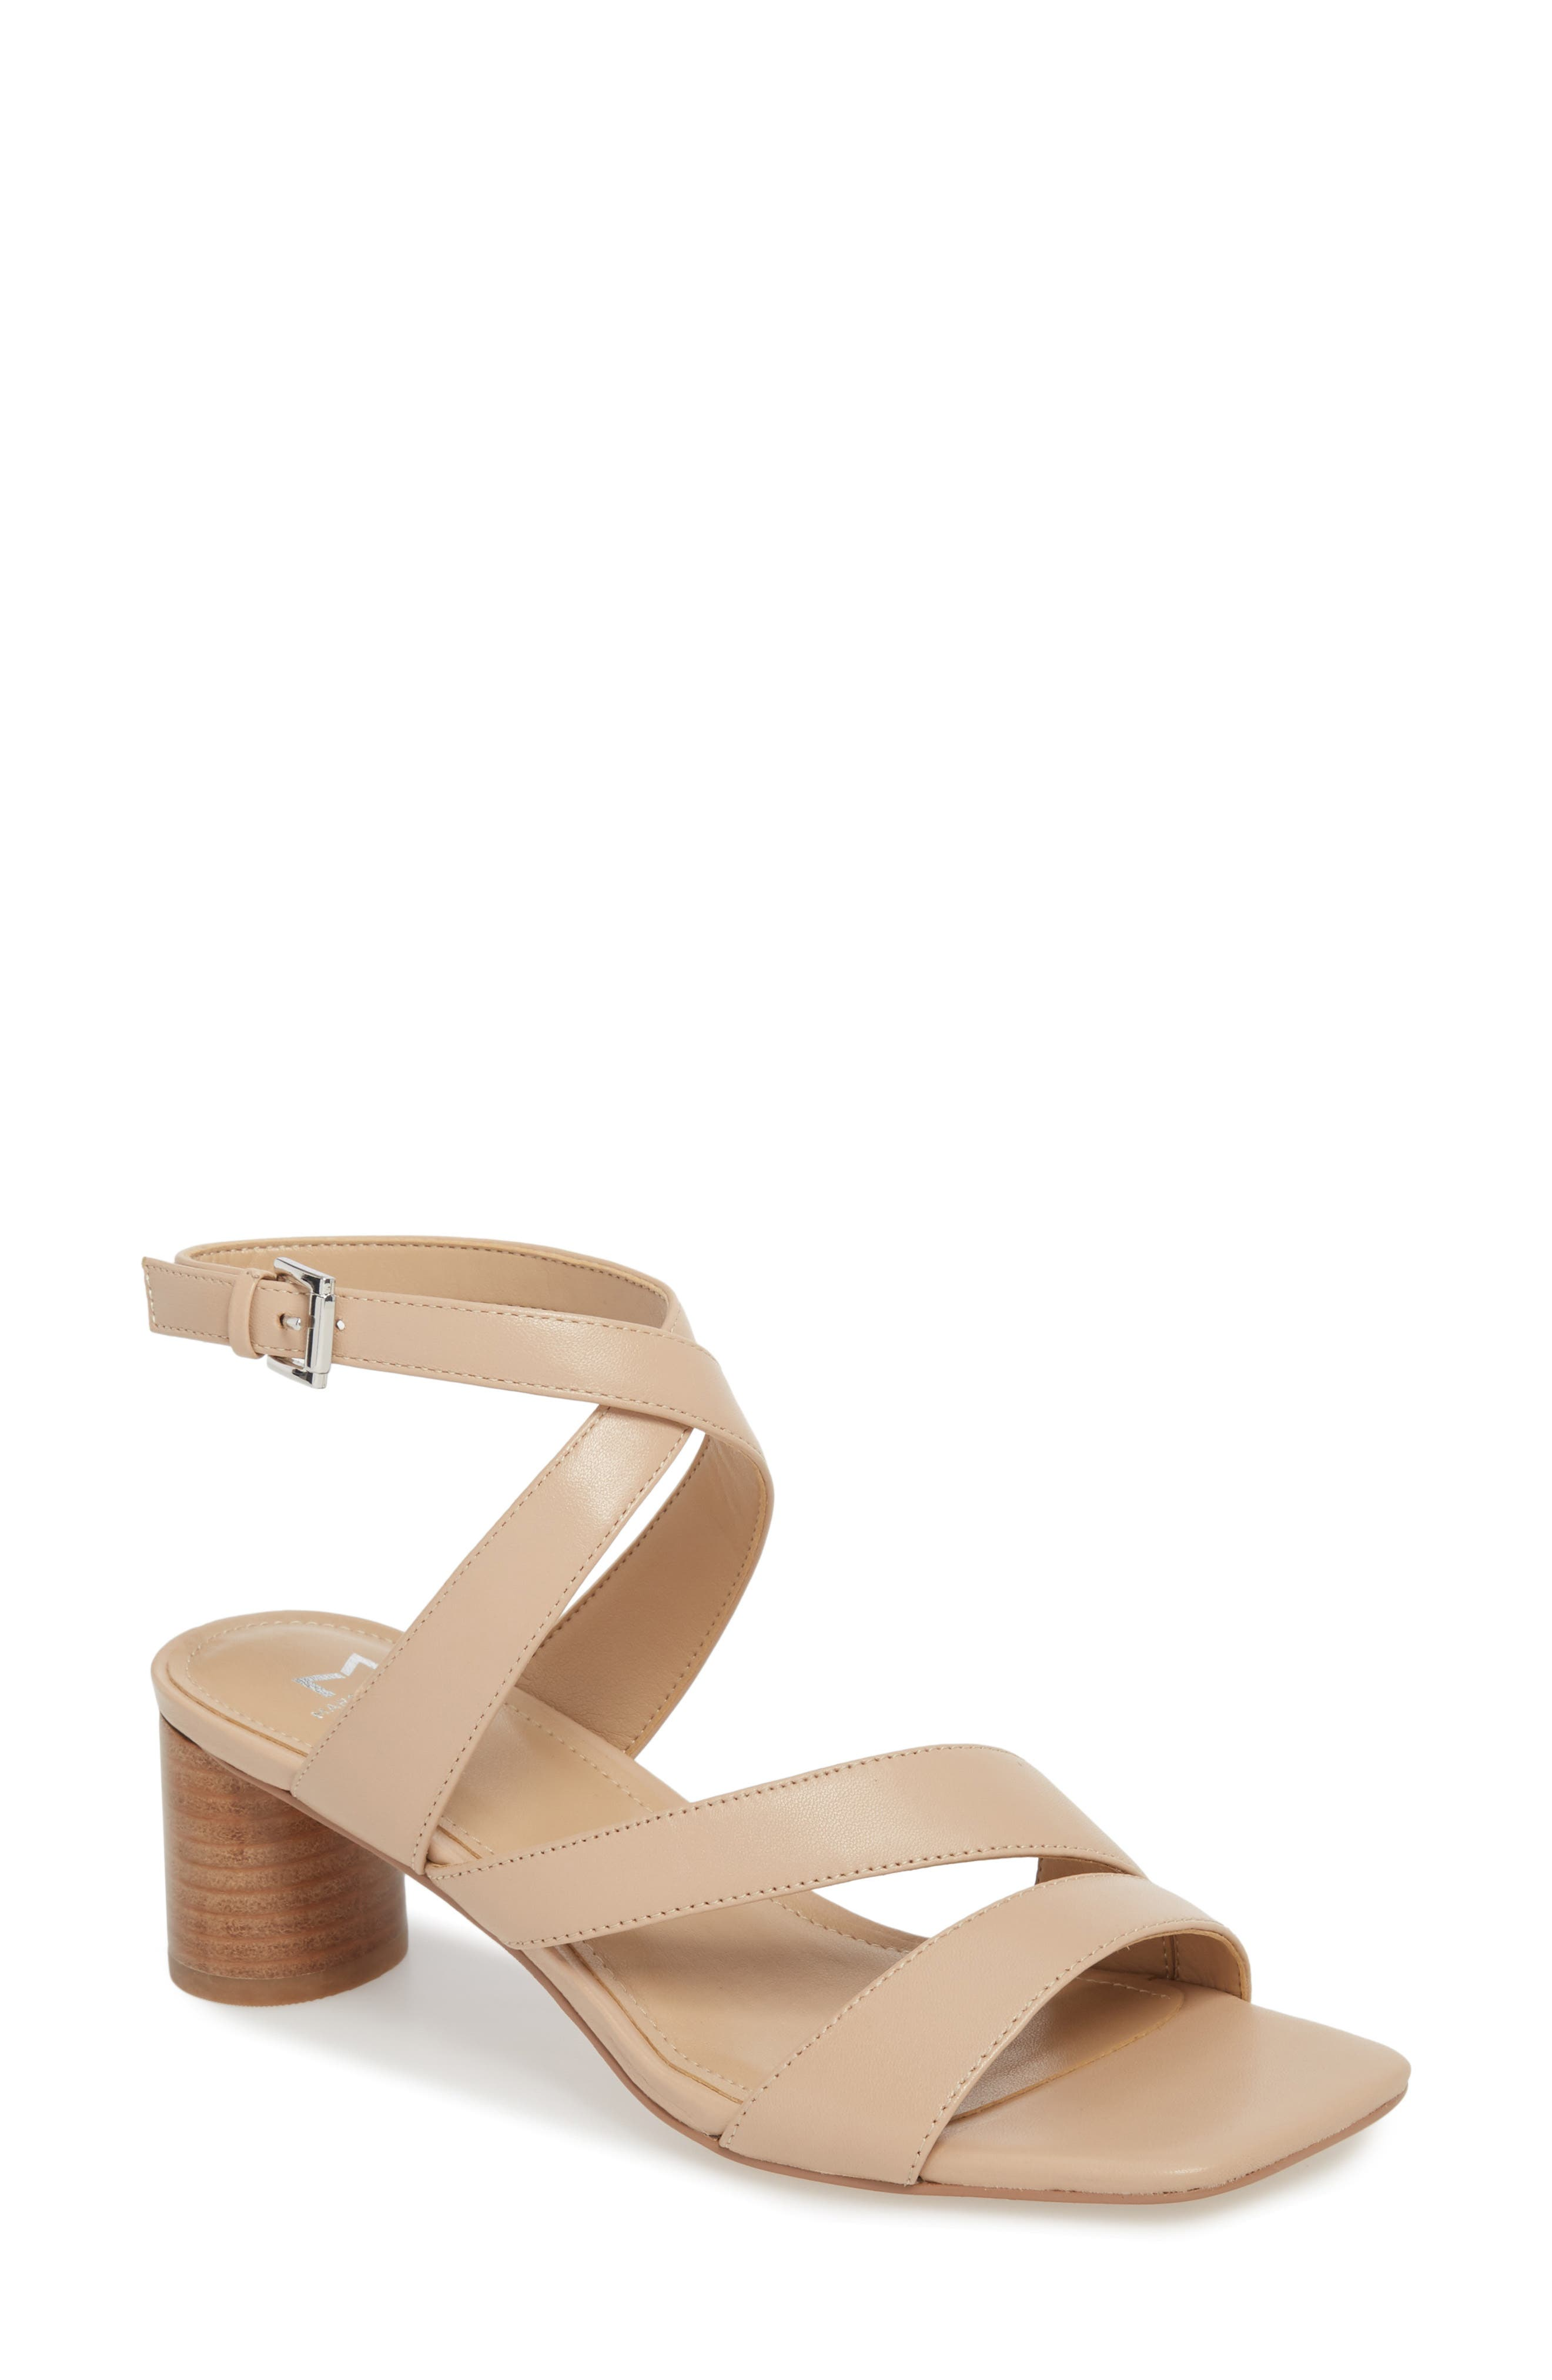 Marc Fischer LTD Idana Strappy Sandal,                         Main,                         color, Lite Latte Leather